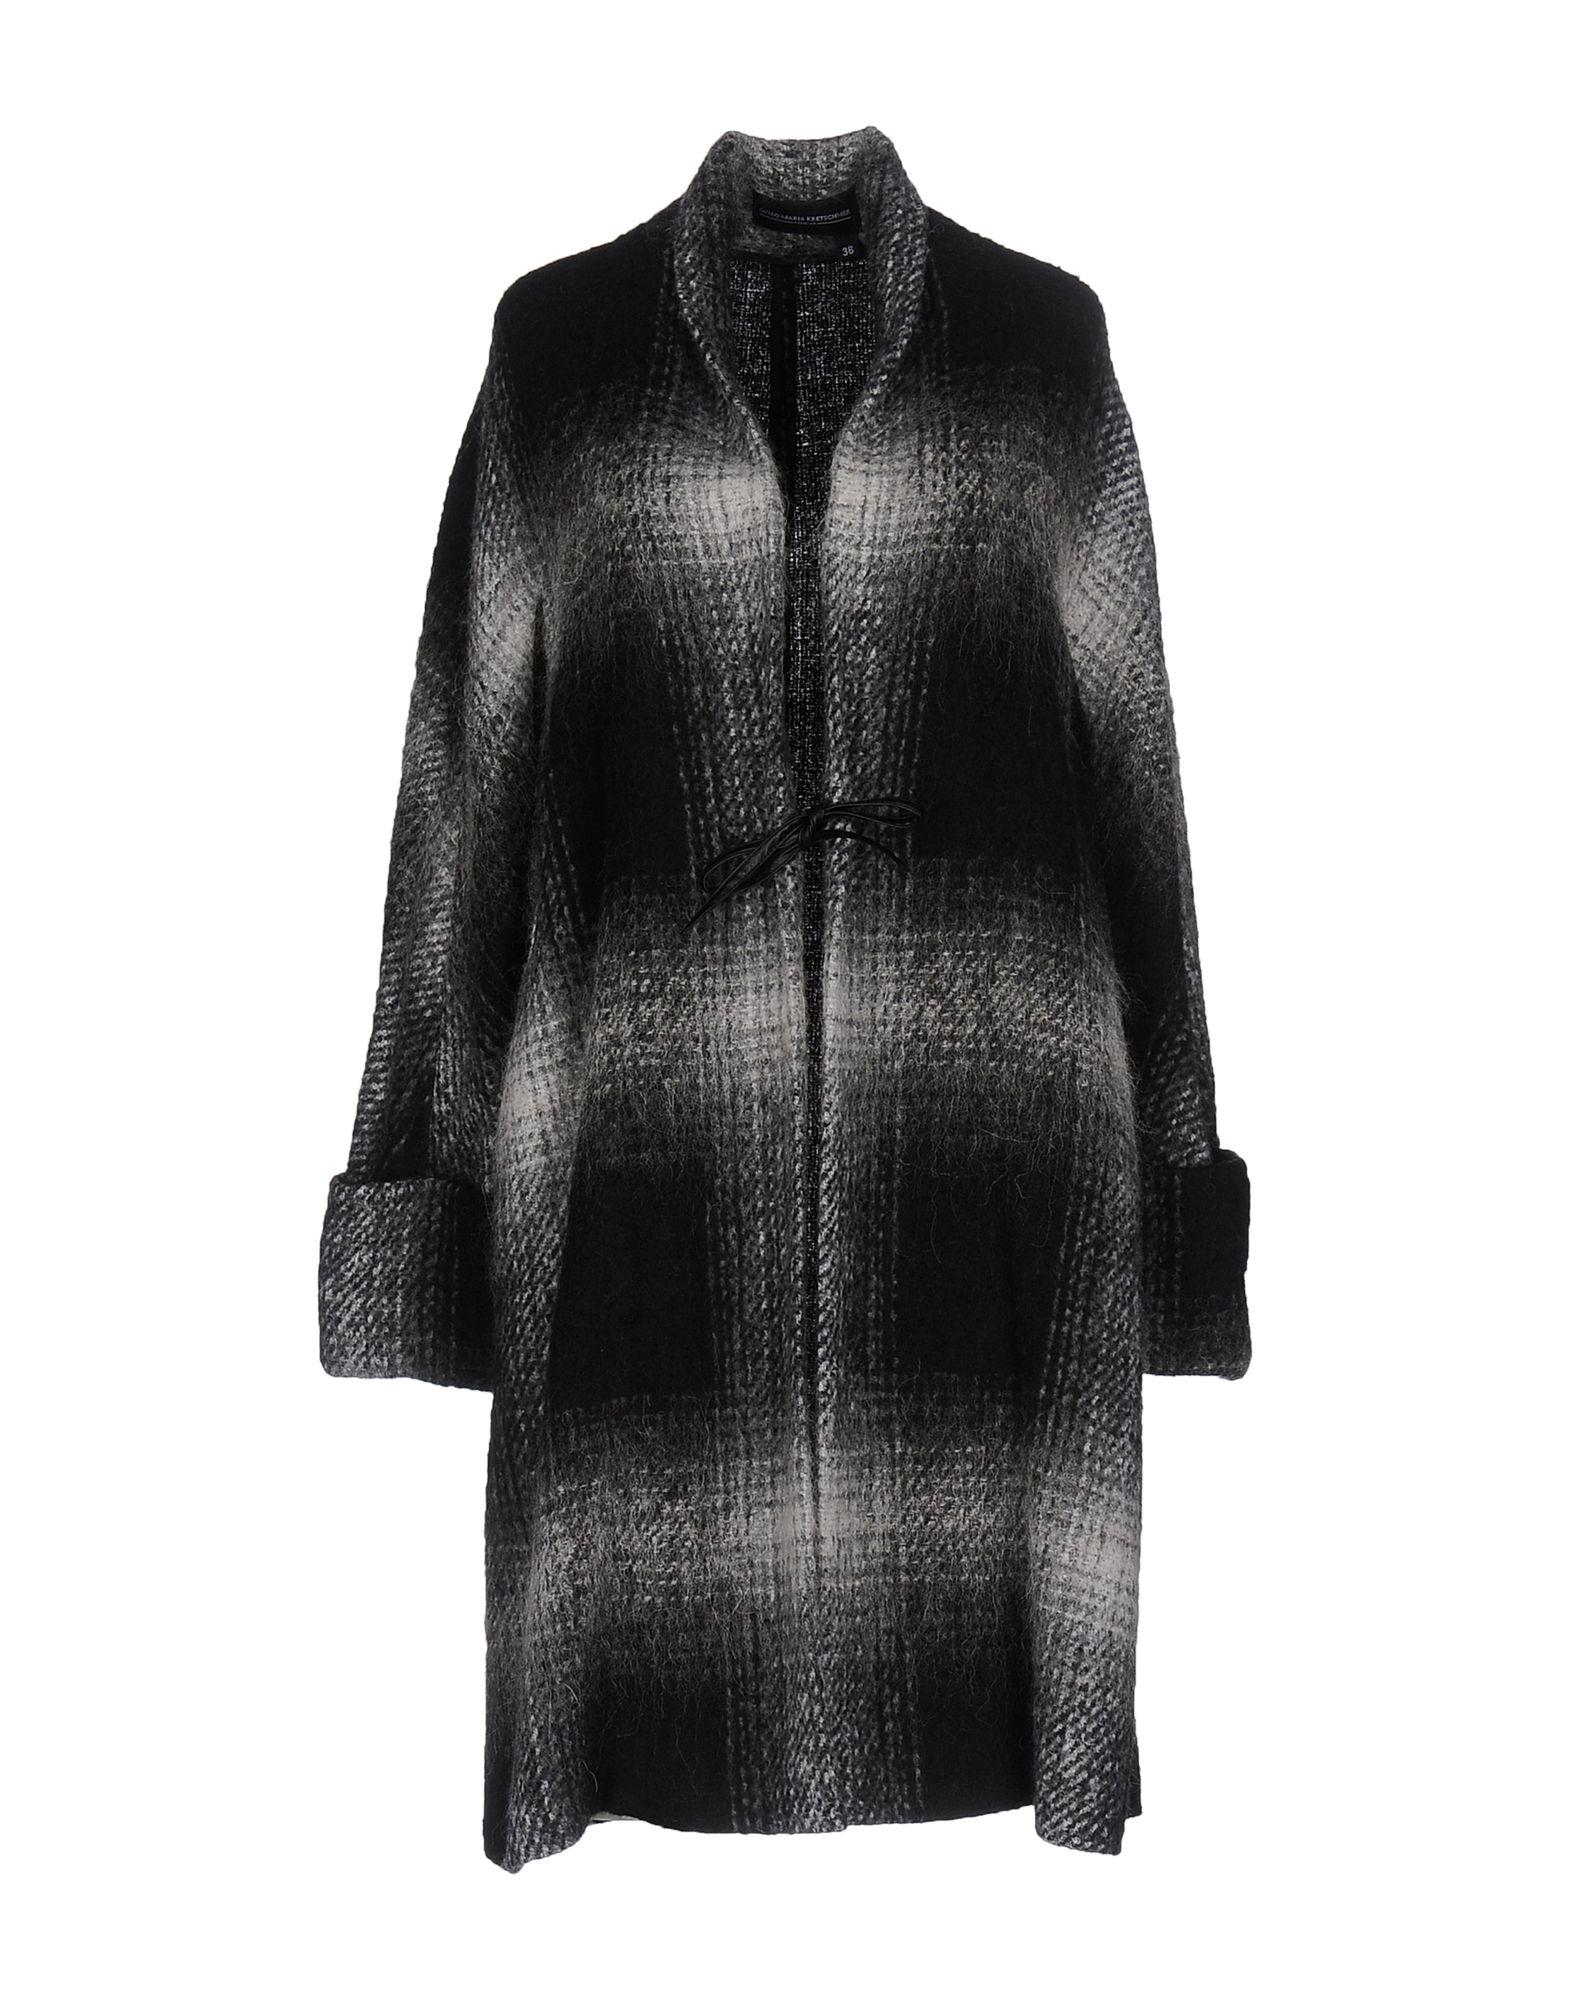 low priced 2c294 077a5 GUIDO MARIA KRETSCHMER Coat - Coats & Jackets | YOOX.COM